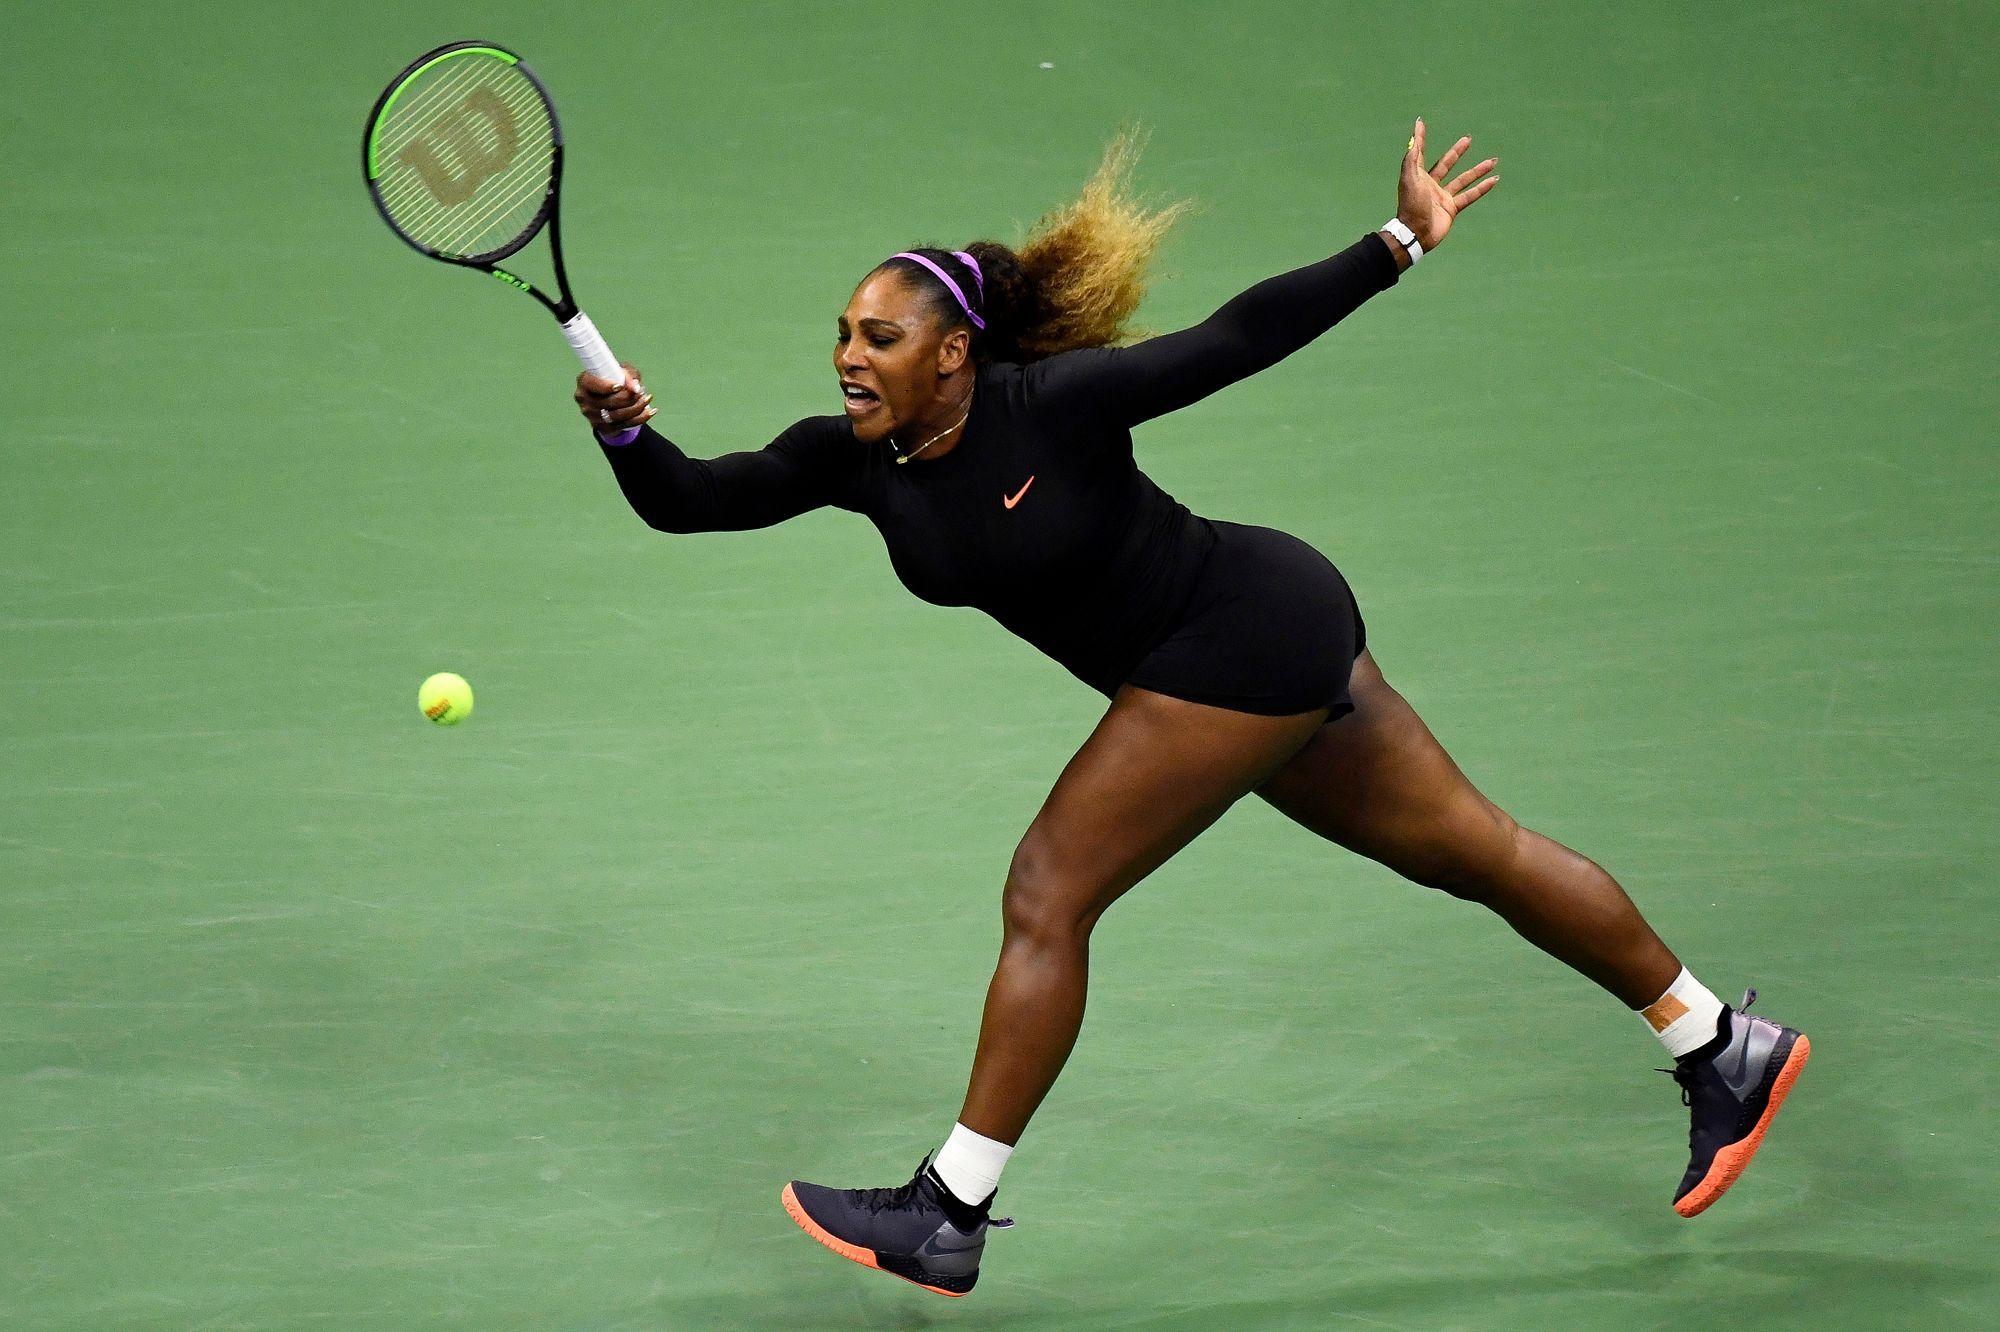 La deuxième casquette de Serena Williams